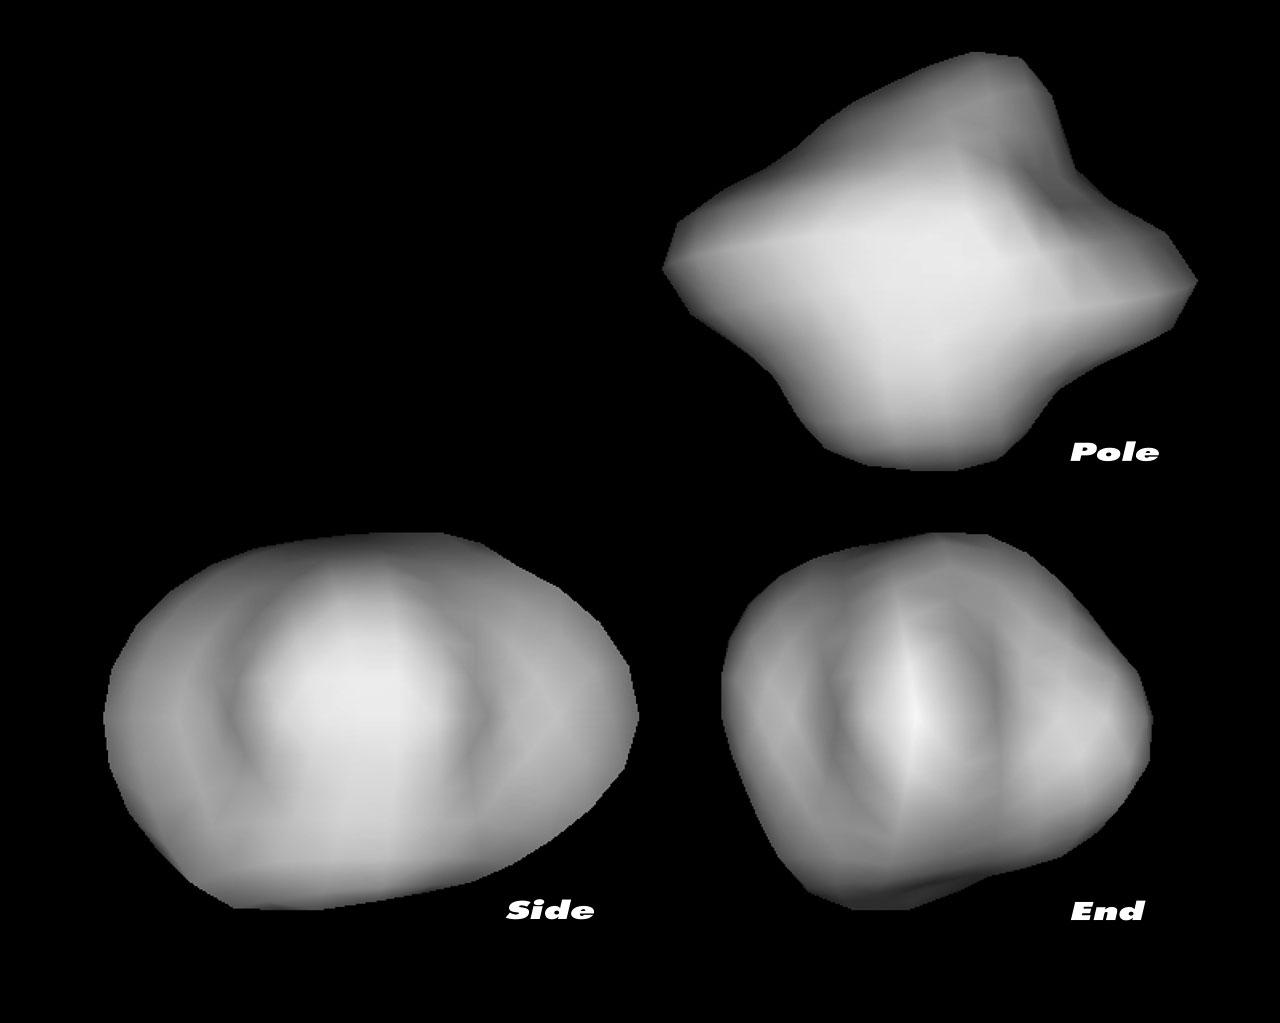 3-D models of comet 67P/Churyumov-Gerasimenko's nucleus